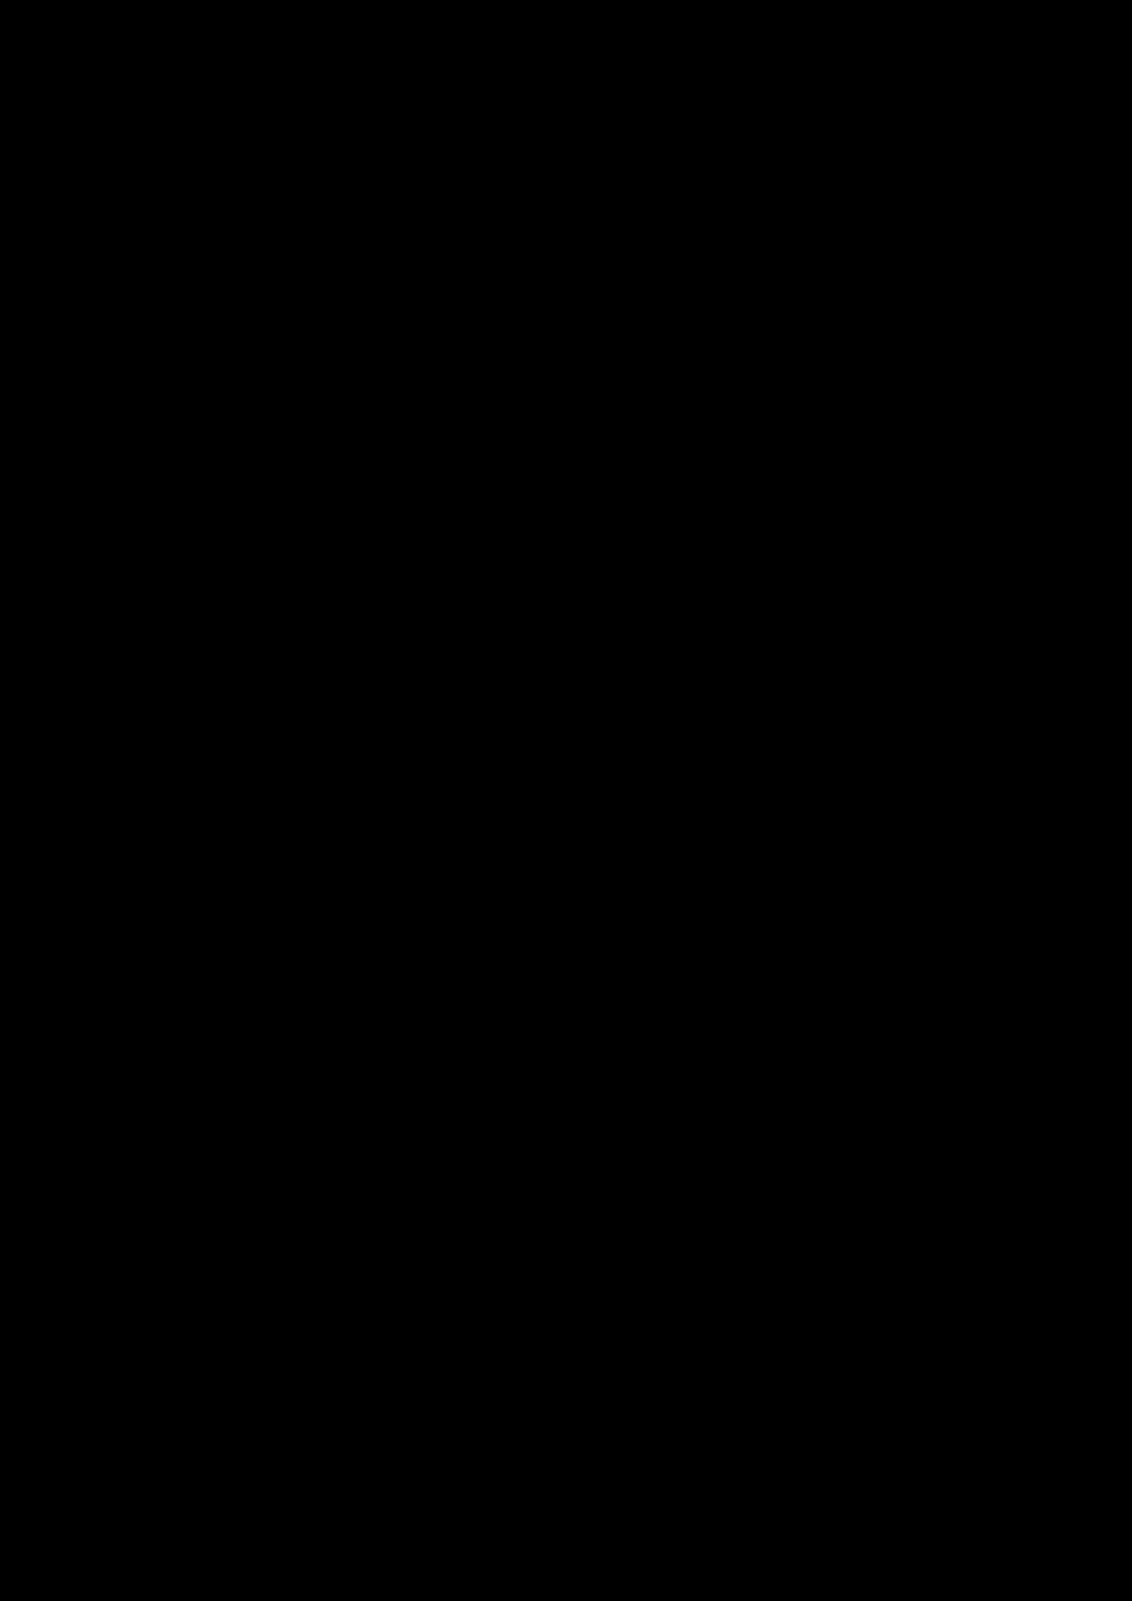 Prosti slide, Image 5